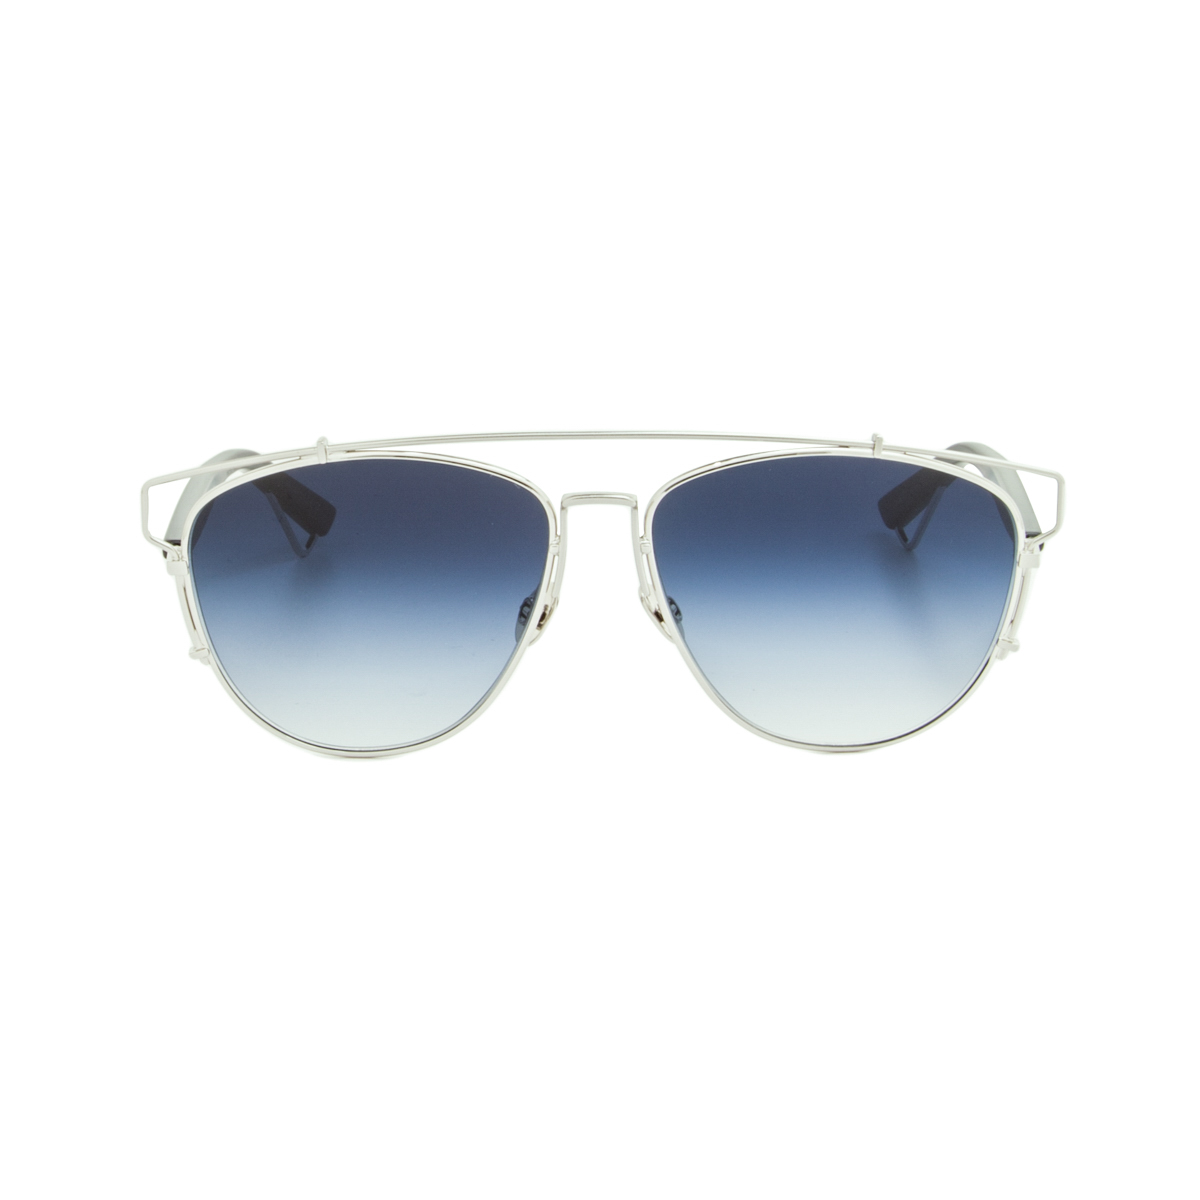 Glasses Gradient Frame : Dior Technologic Womens Aviator Sunglasses 84J84 Silver ...